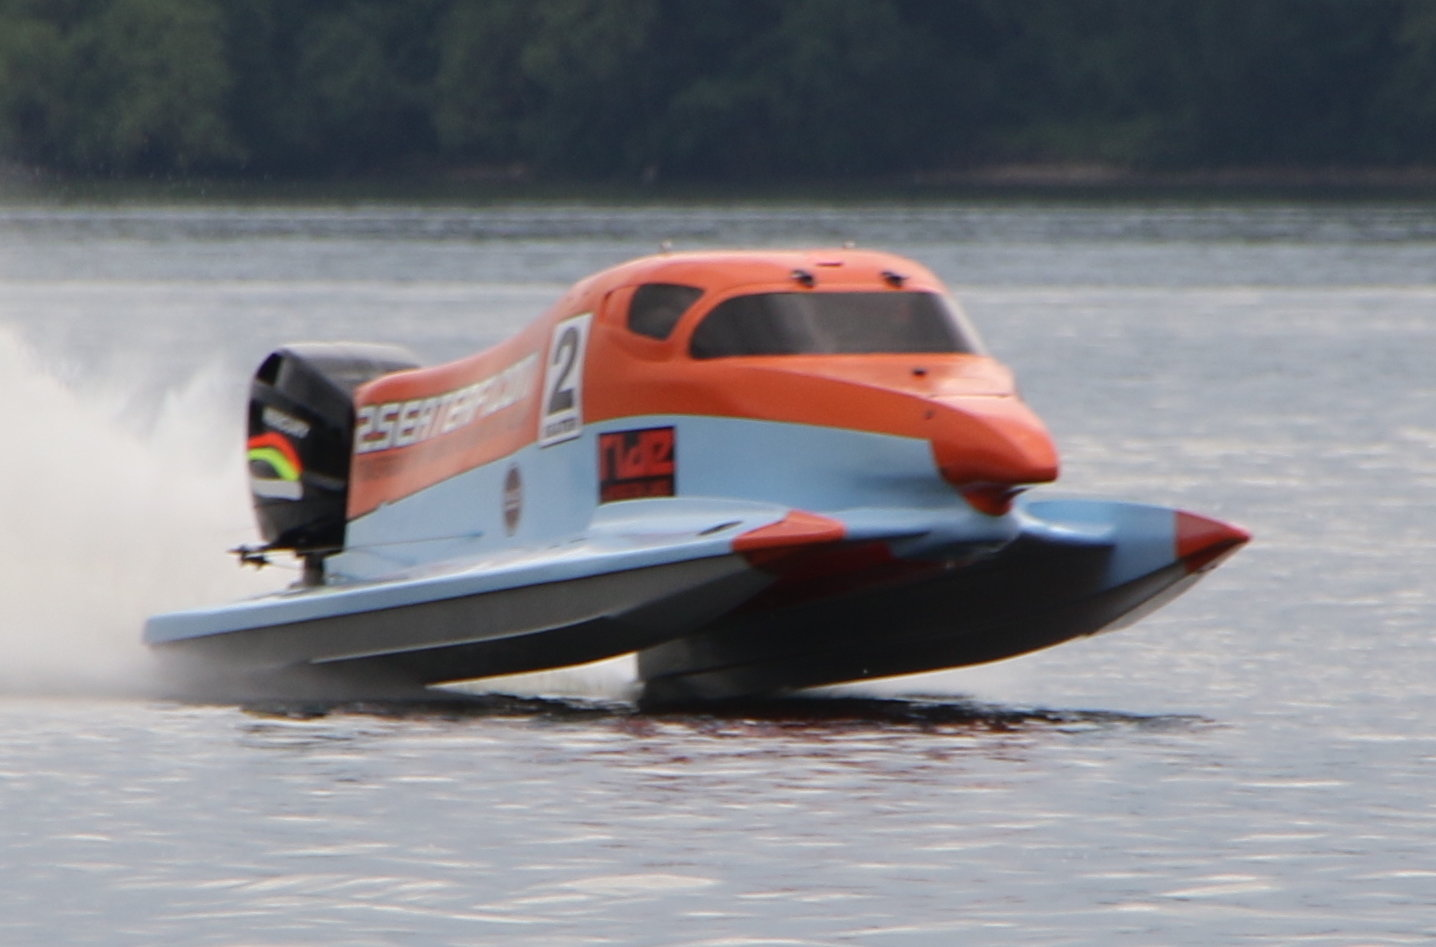 2 Seater F1 Powerboat Ride, Wyboston Lakes, September 1, 2018